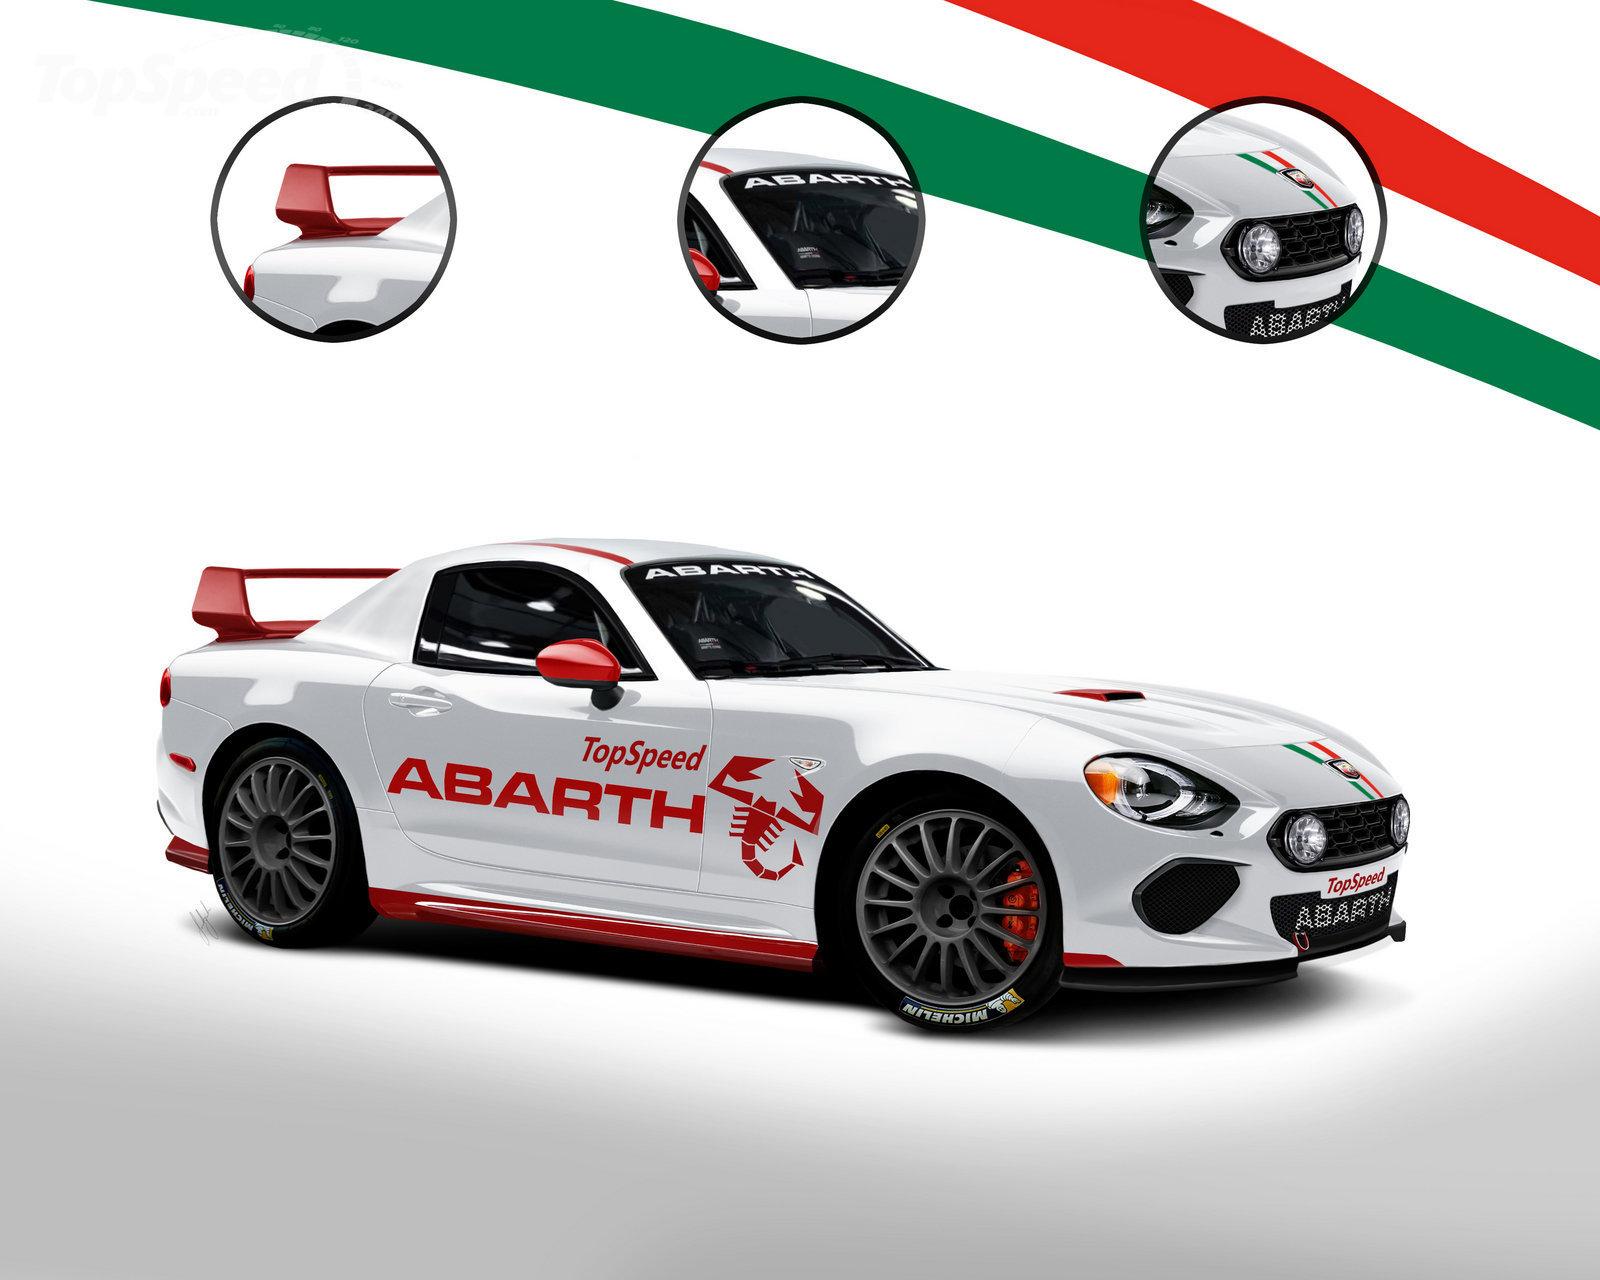 abarth-124-spider-wrc-top-speed